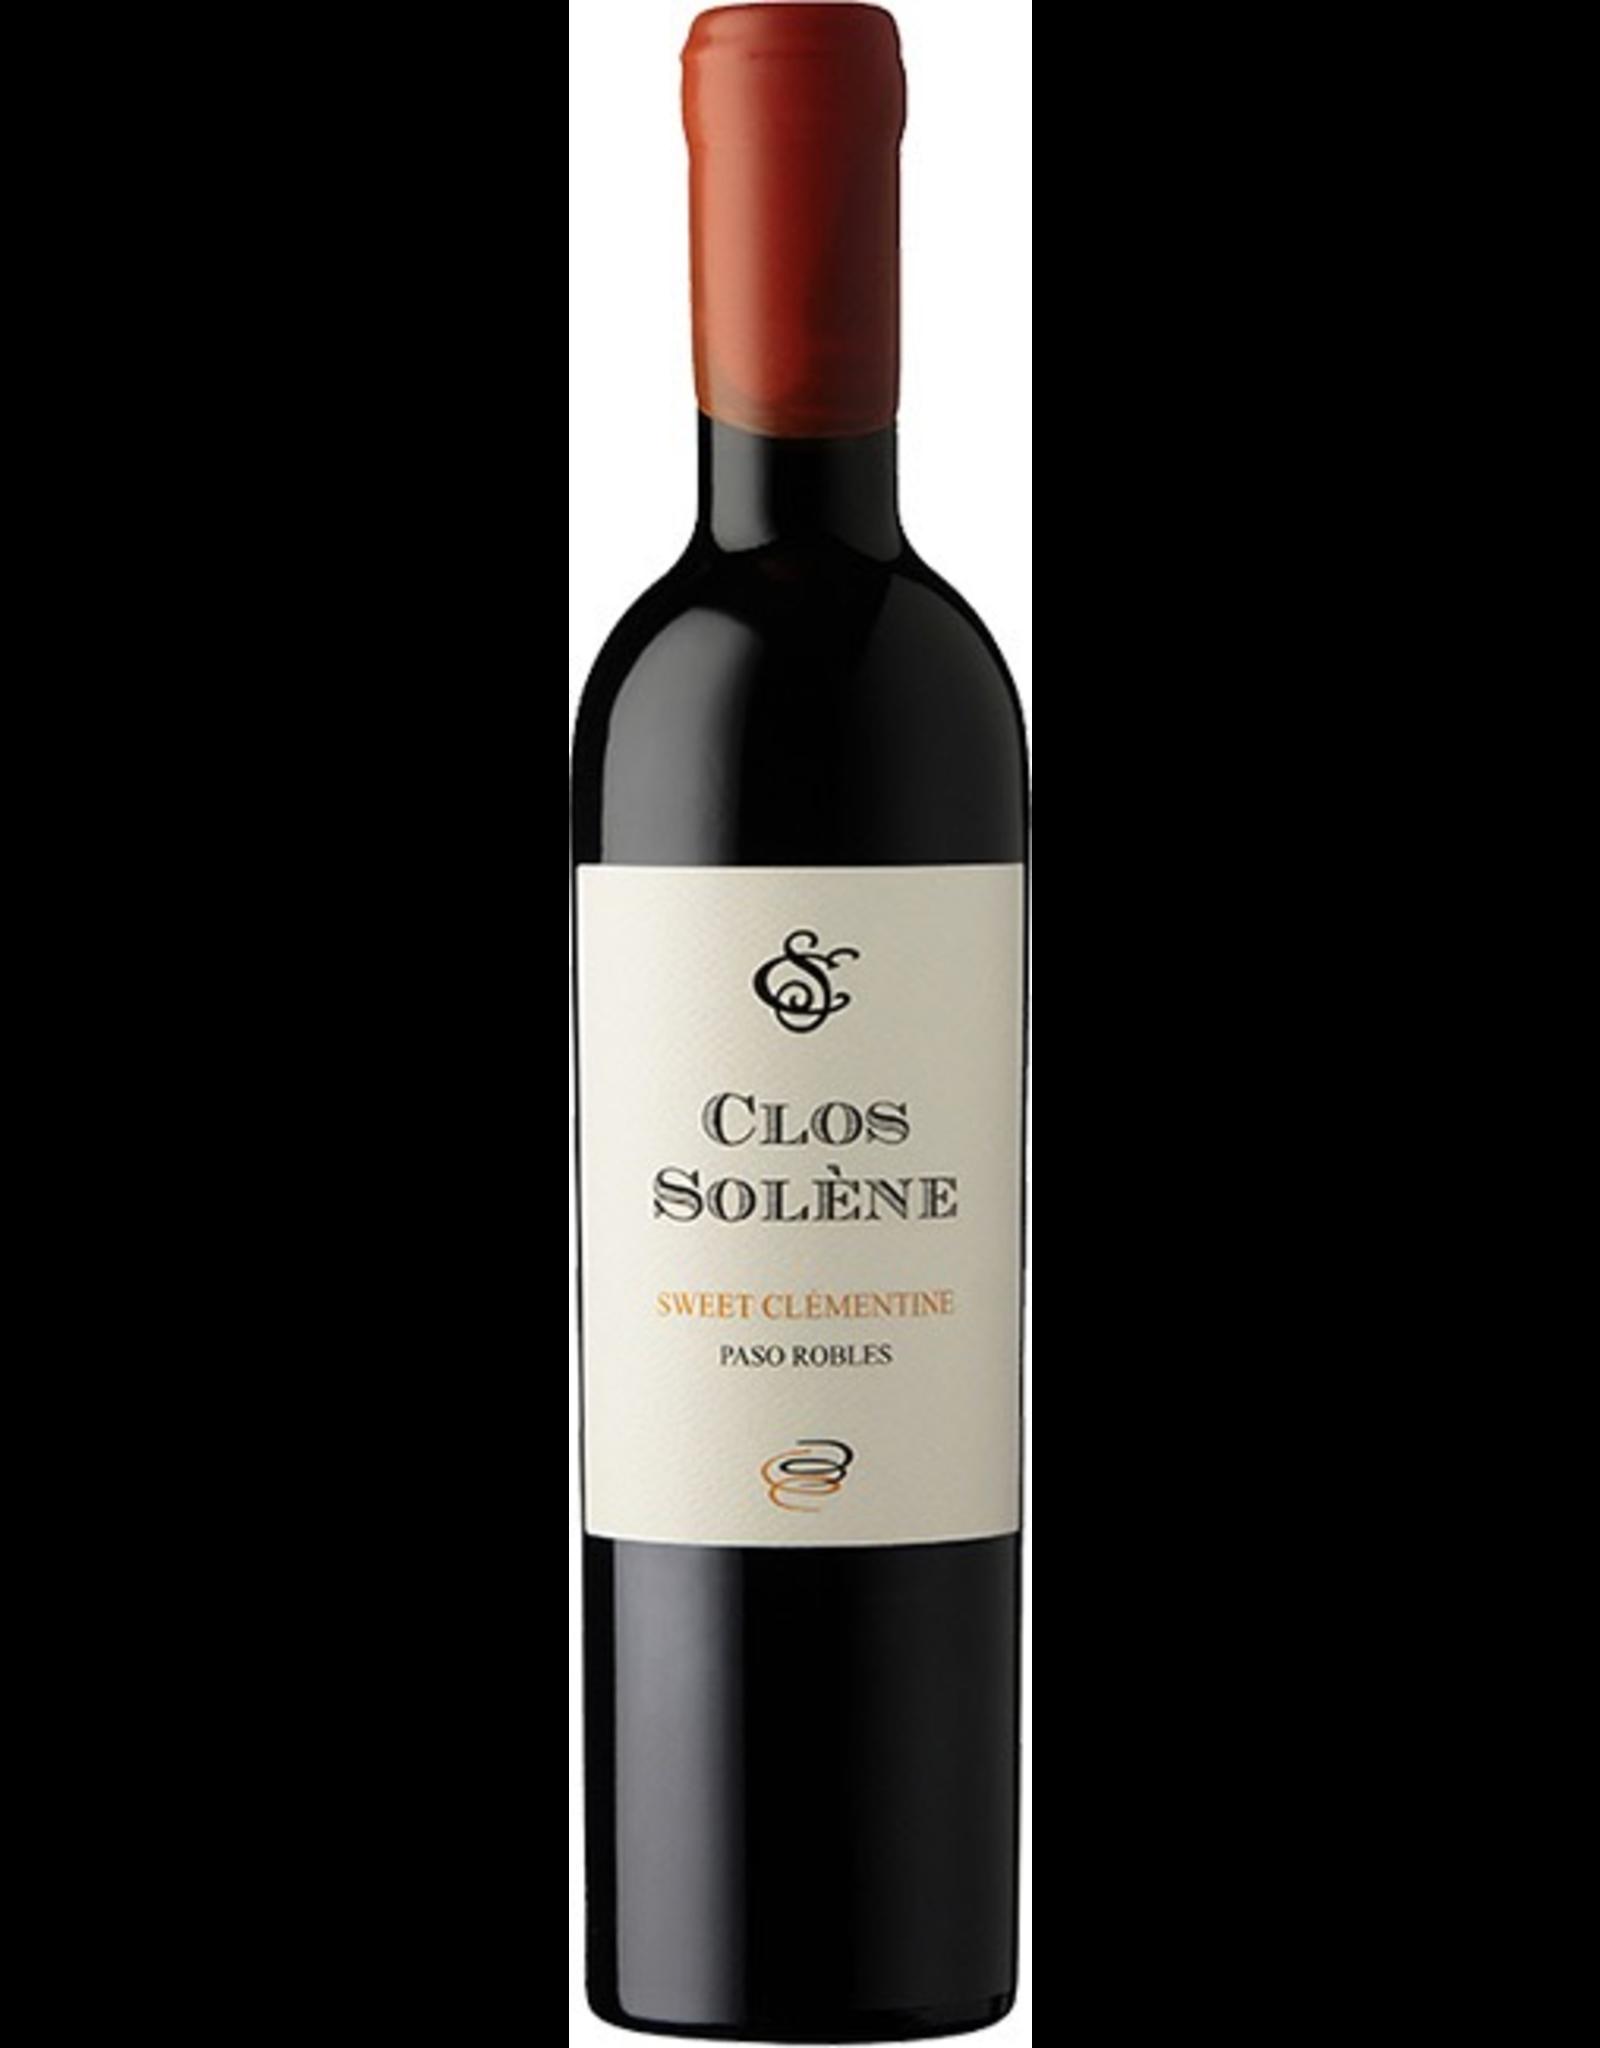 Desert Wine 2015, 375ml Clos Solene Sweet Clementine Desert Wine, Red Rhone Blend, Paso Robles, Central Coast, California, 15.8% Alc, CT88